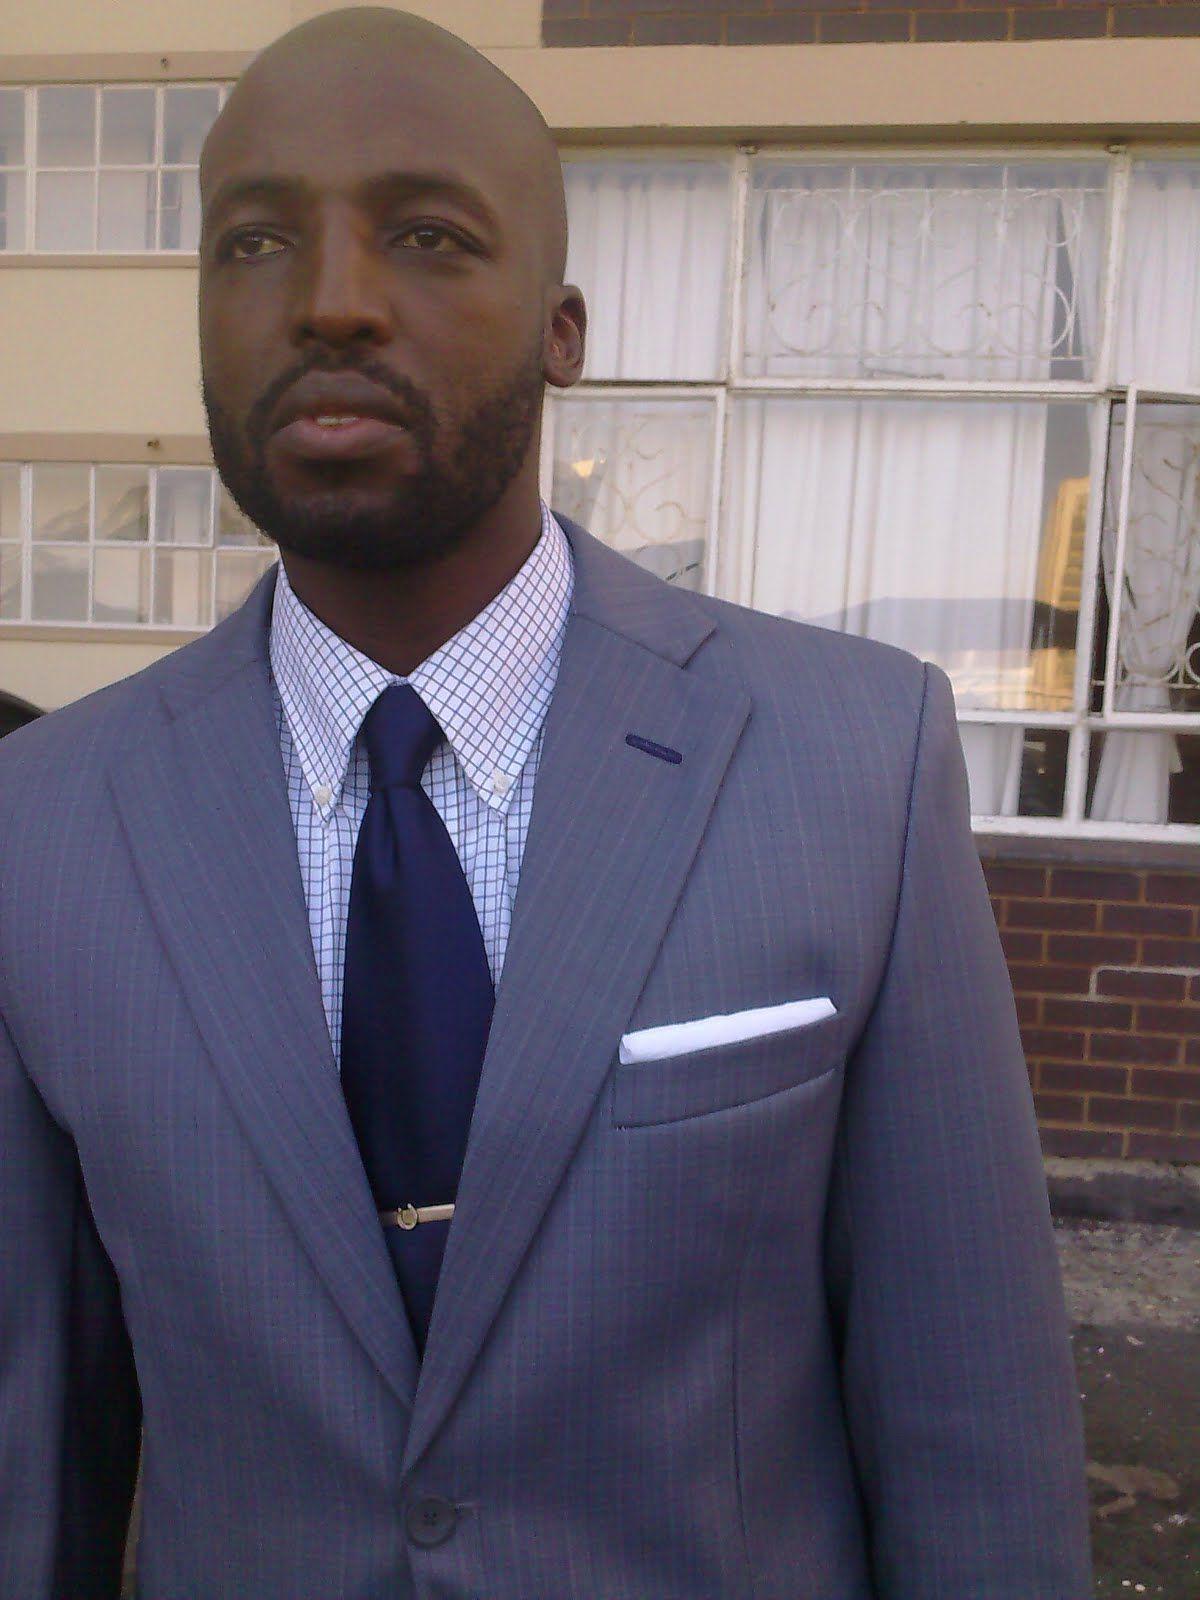 Grey suit, light blue shirt, navy tie.